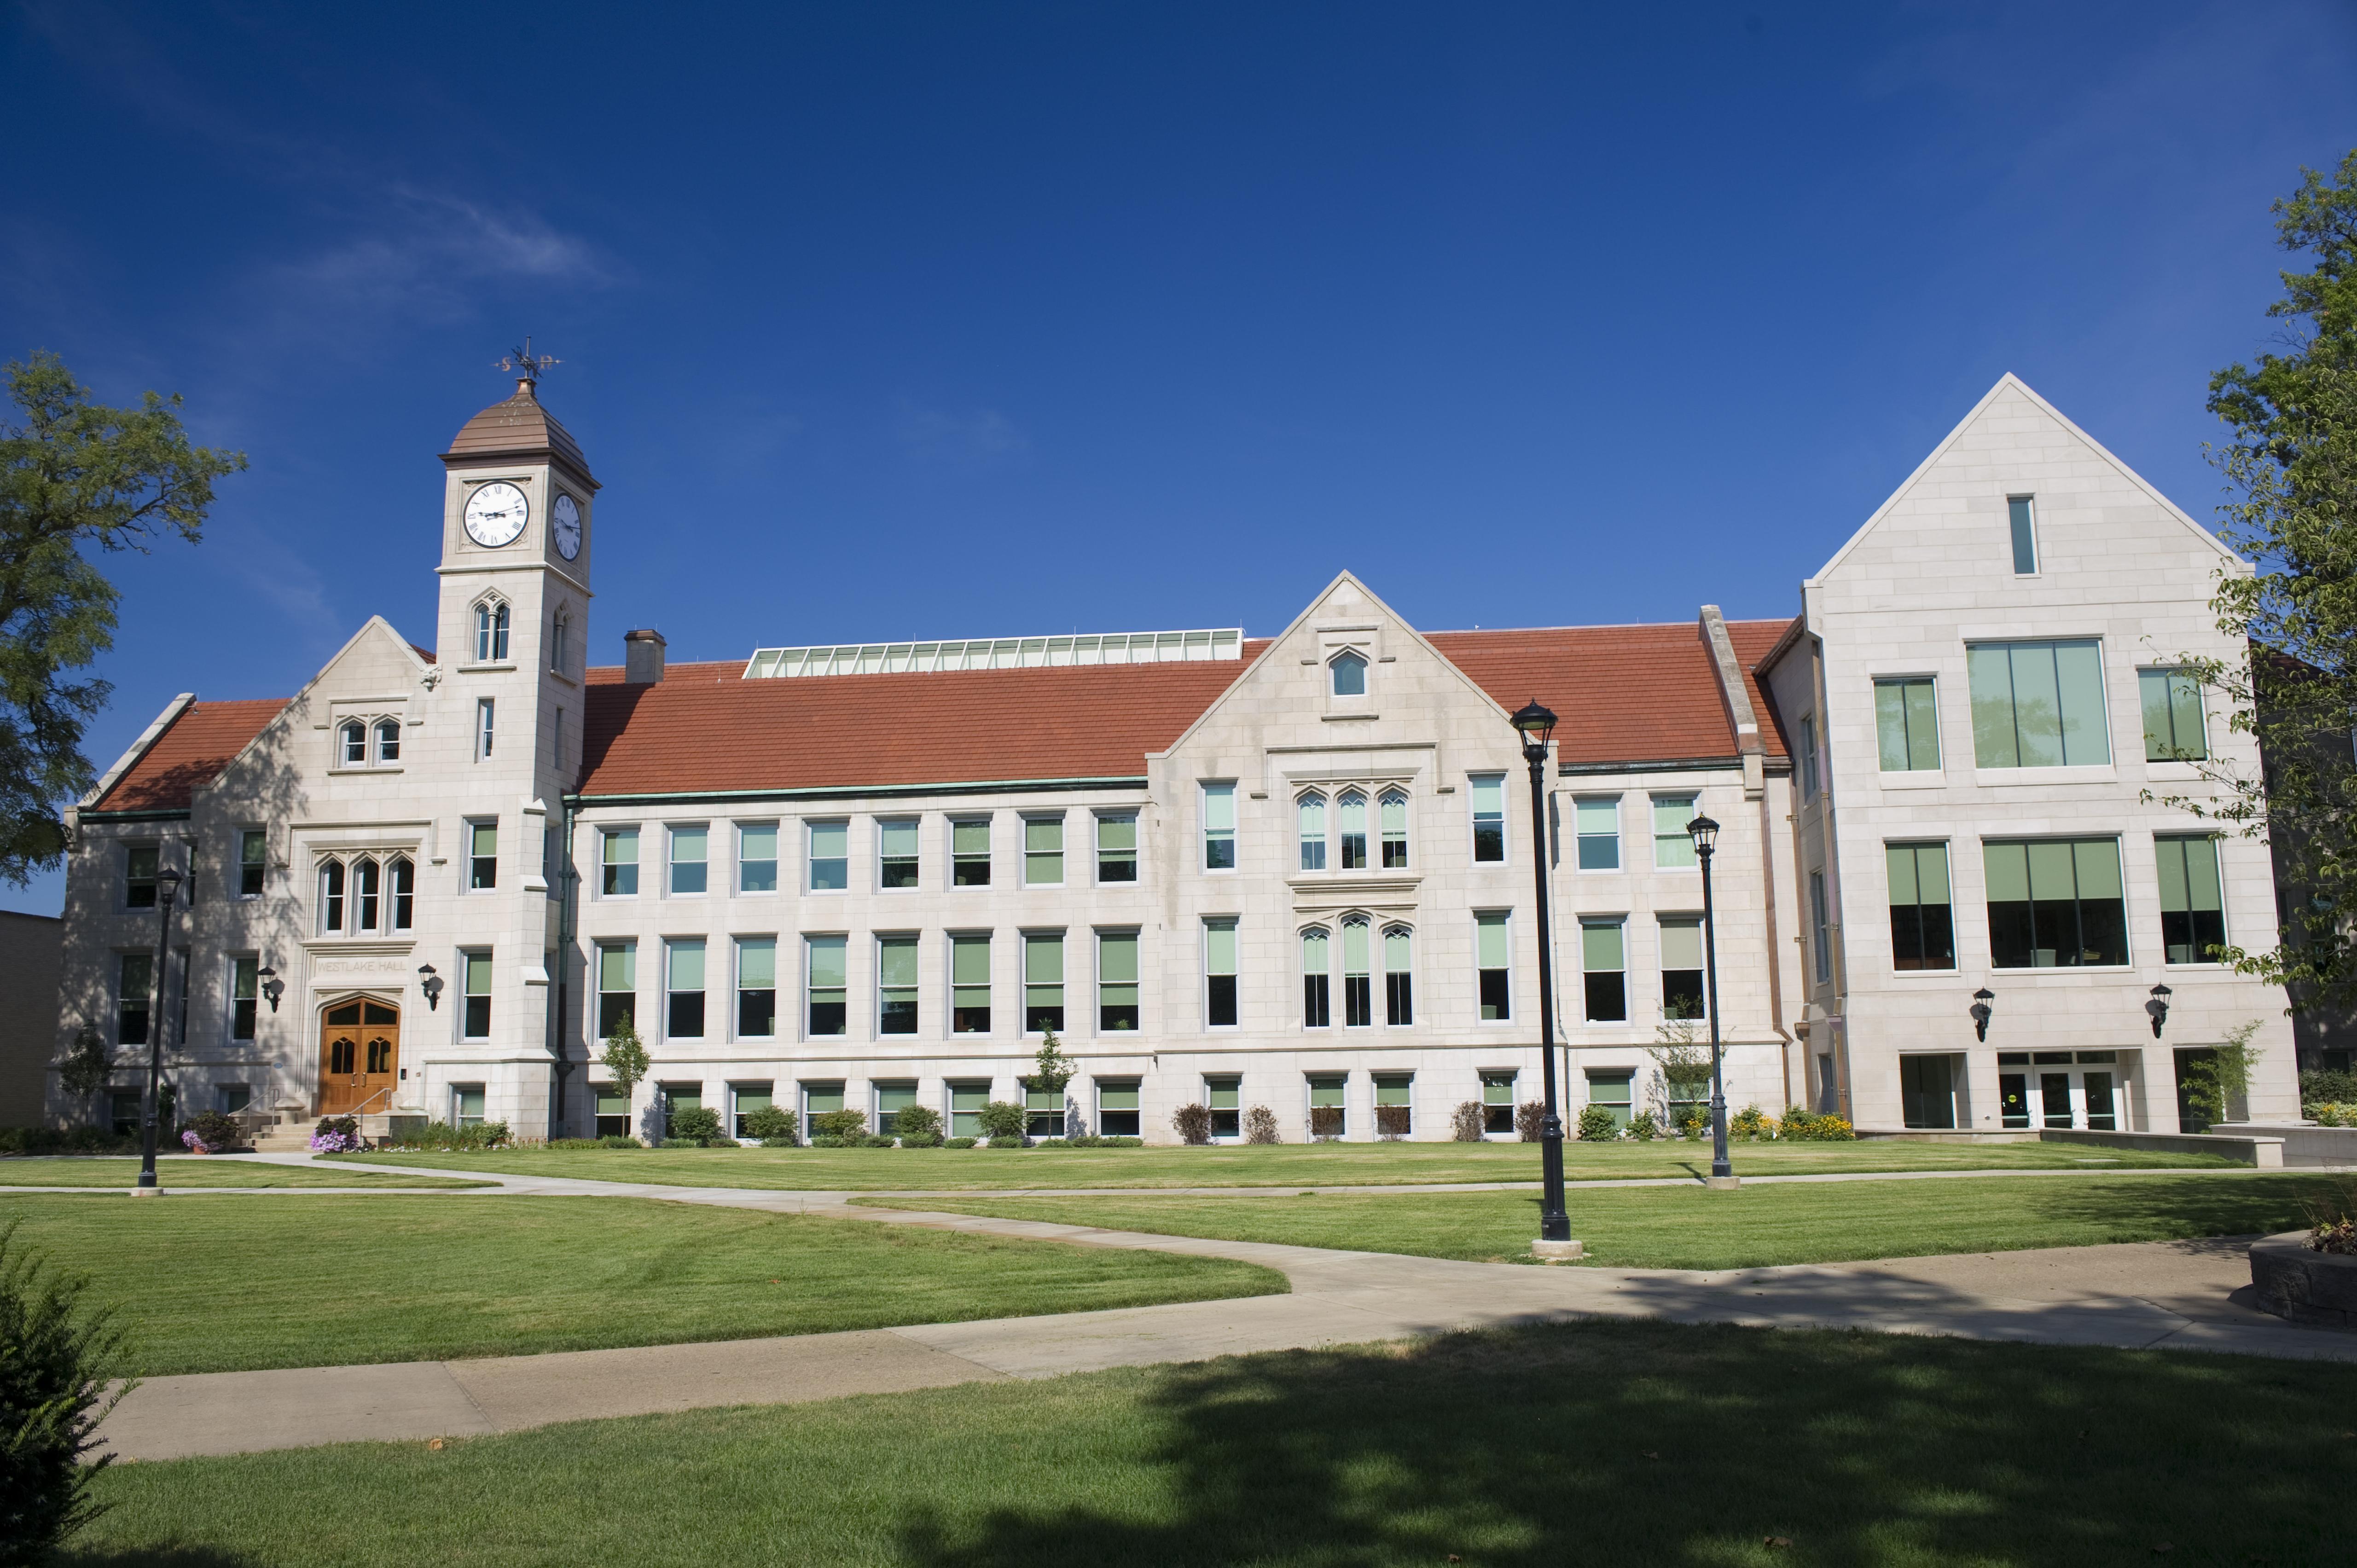 Westlake Hall